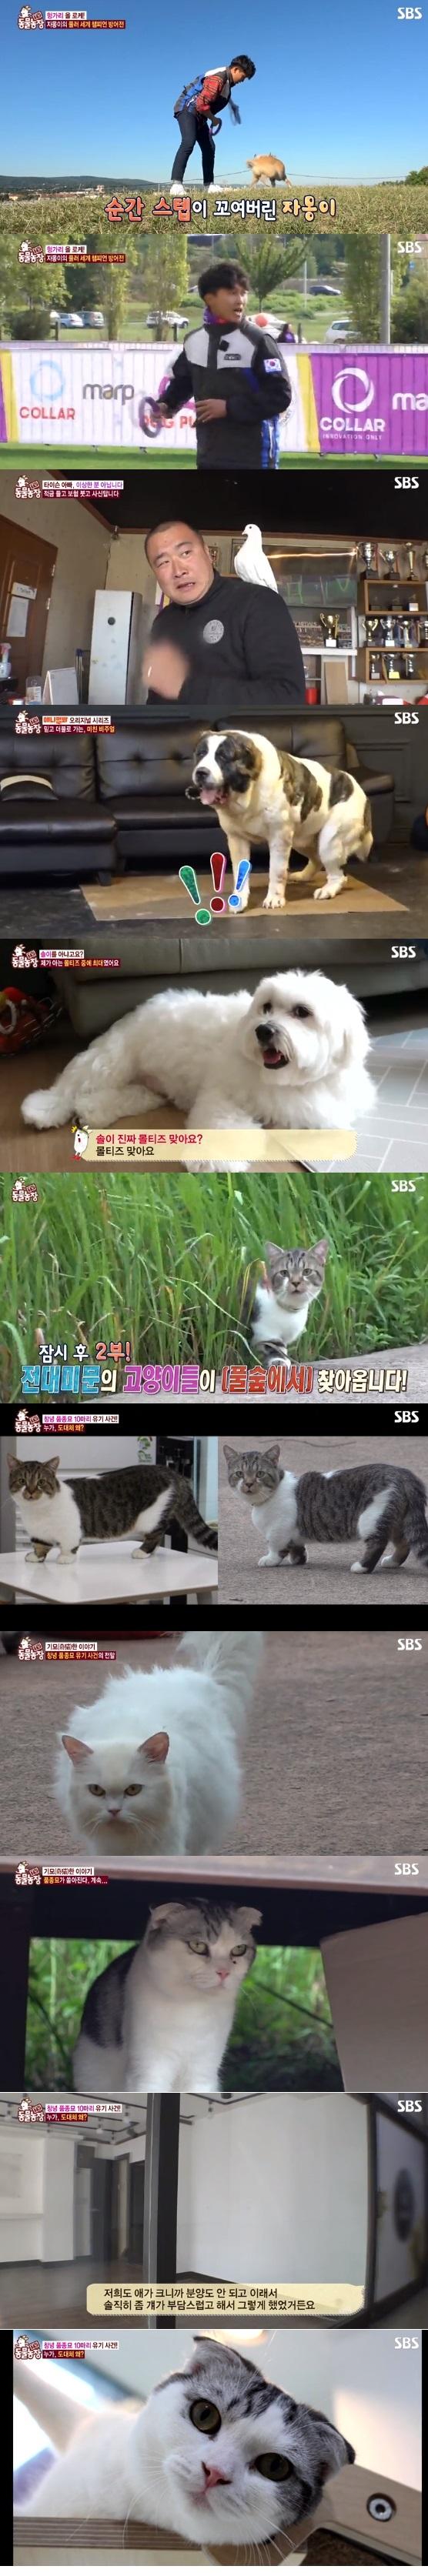 SBS 'TV동물농장' 캡처